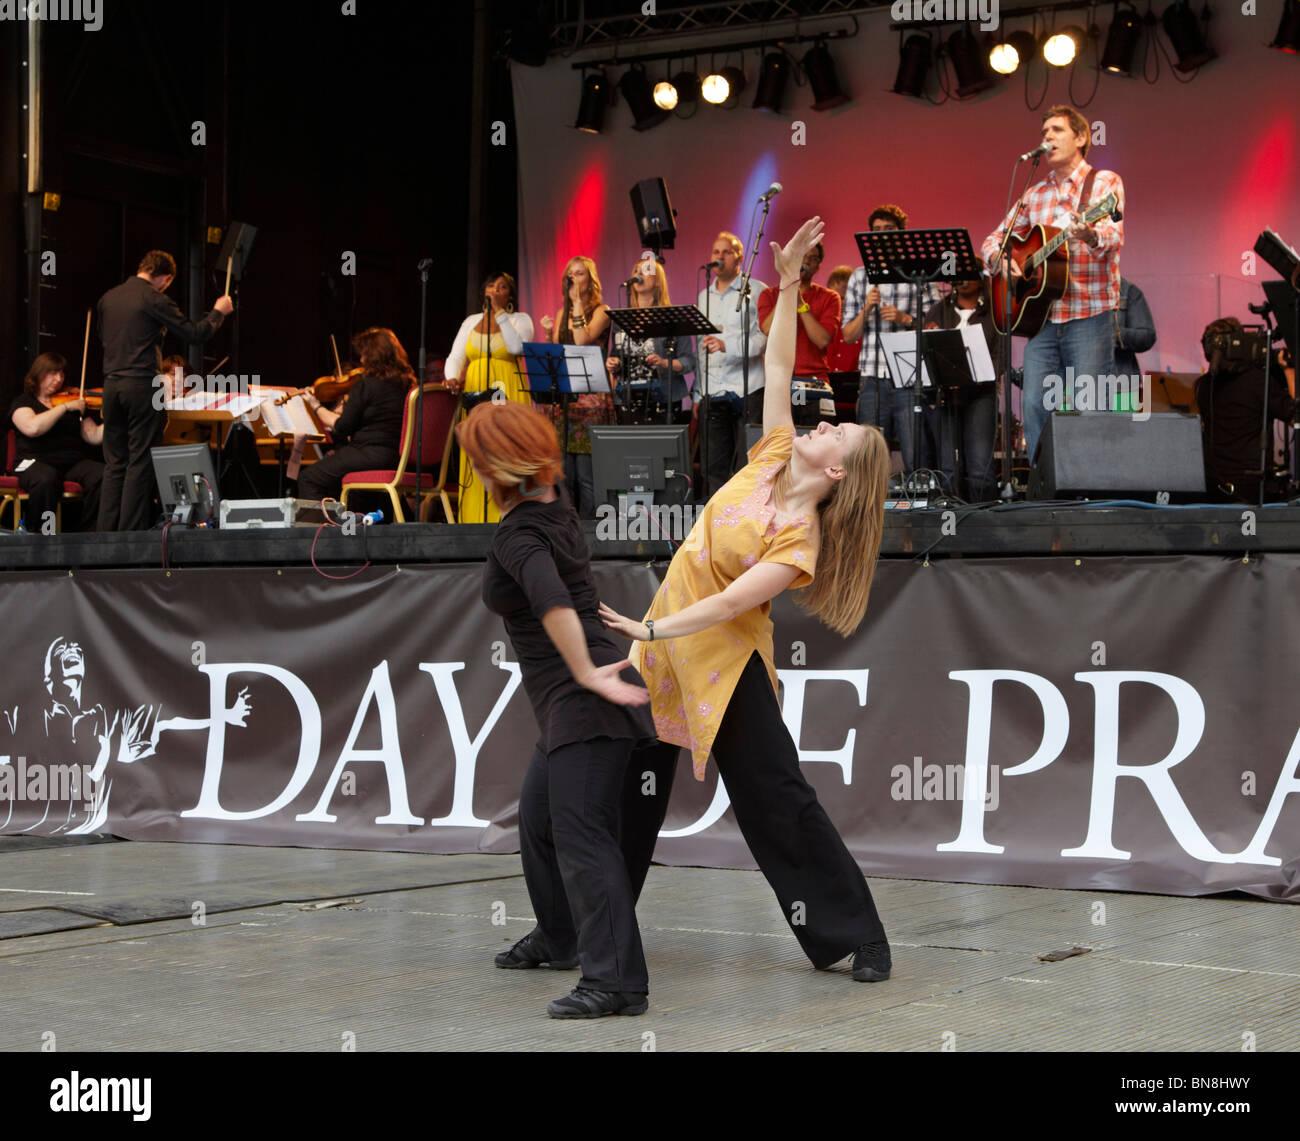 2010 London Global Day of Prayer - Stock Image